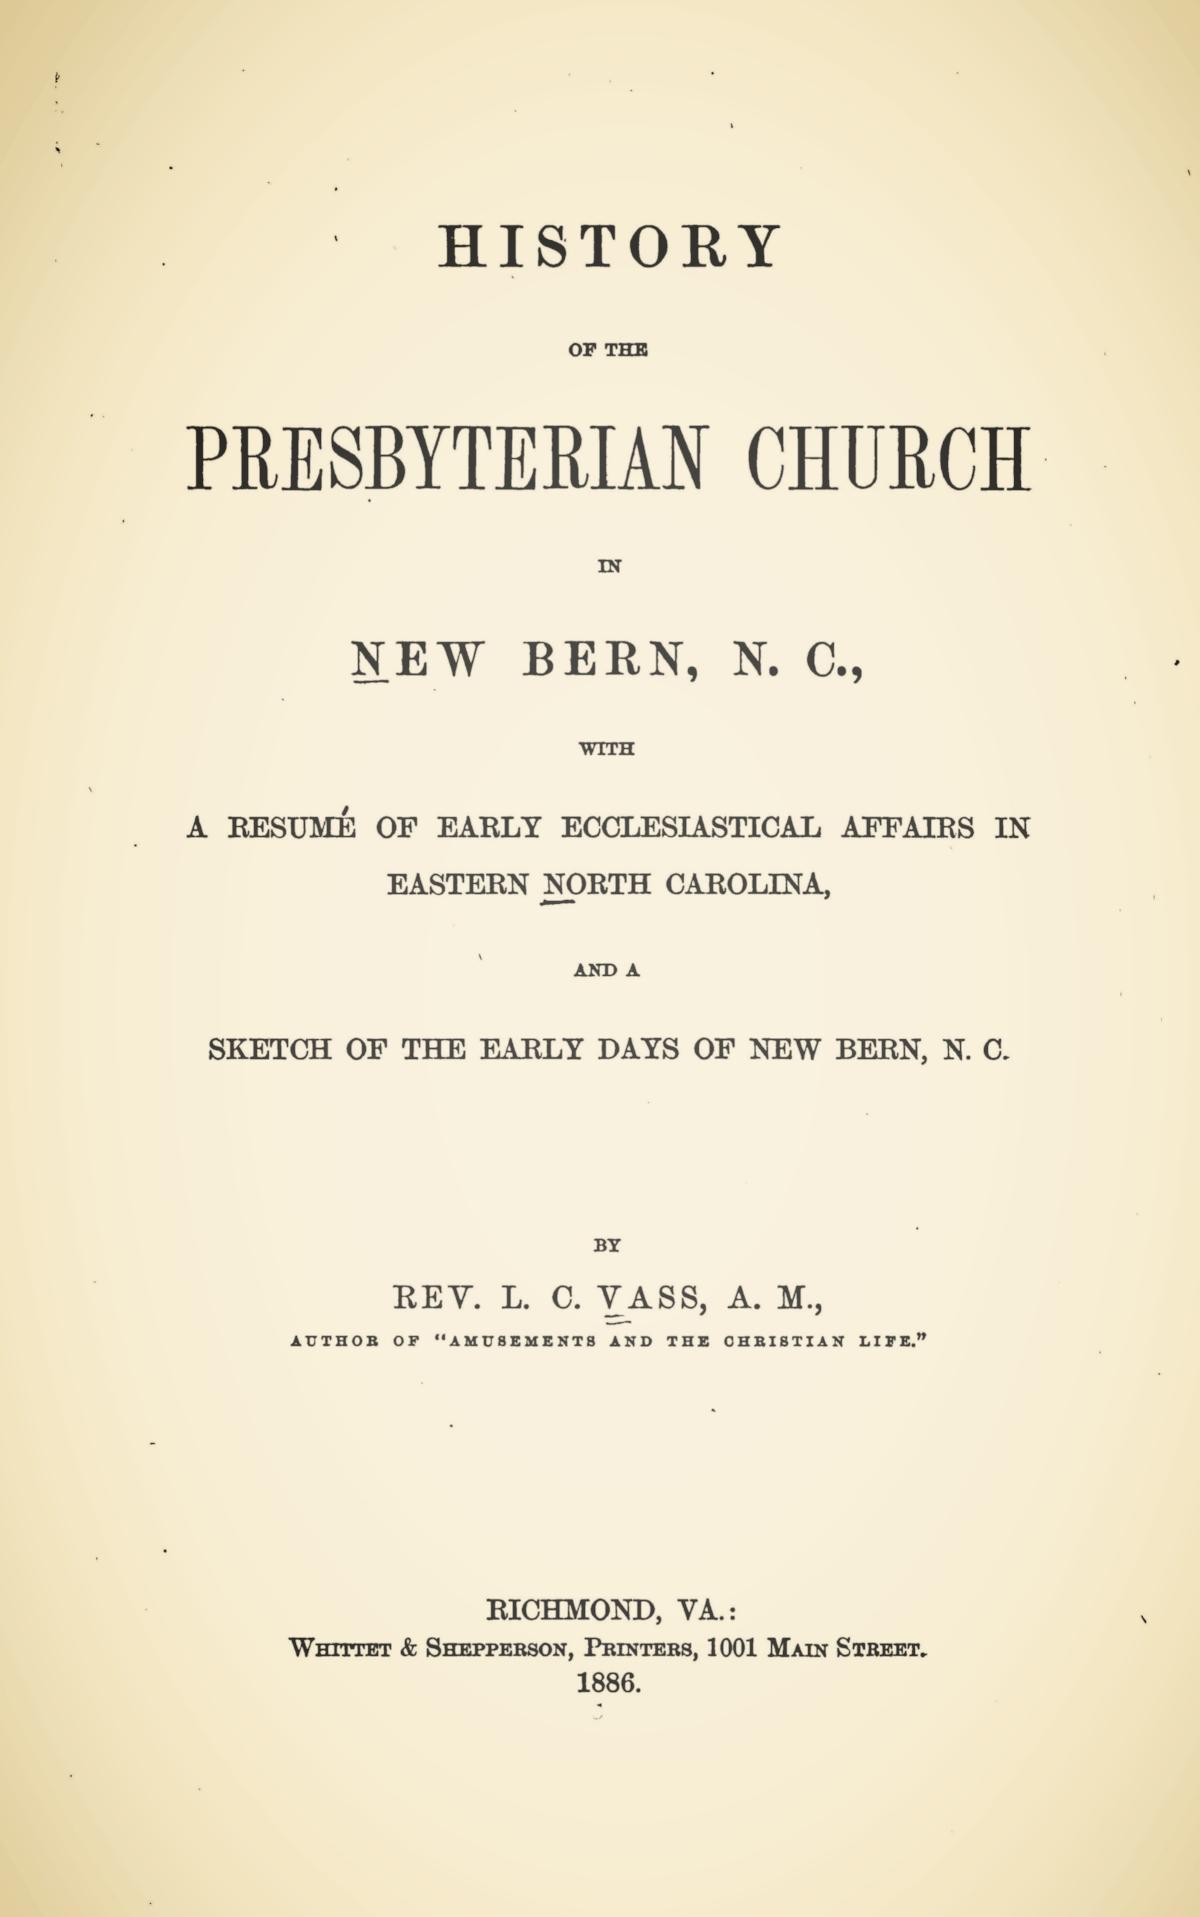 Vass, Lachlan Cumming, History of the Presbyterian Church in New Bern, N.C. Title Page.jpg